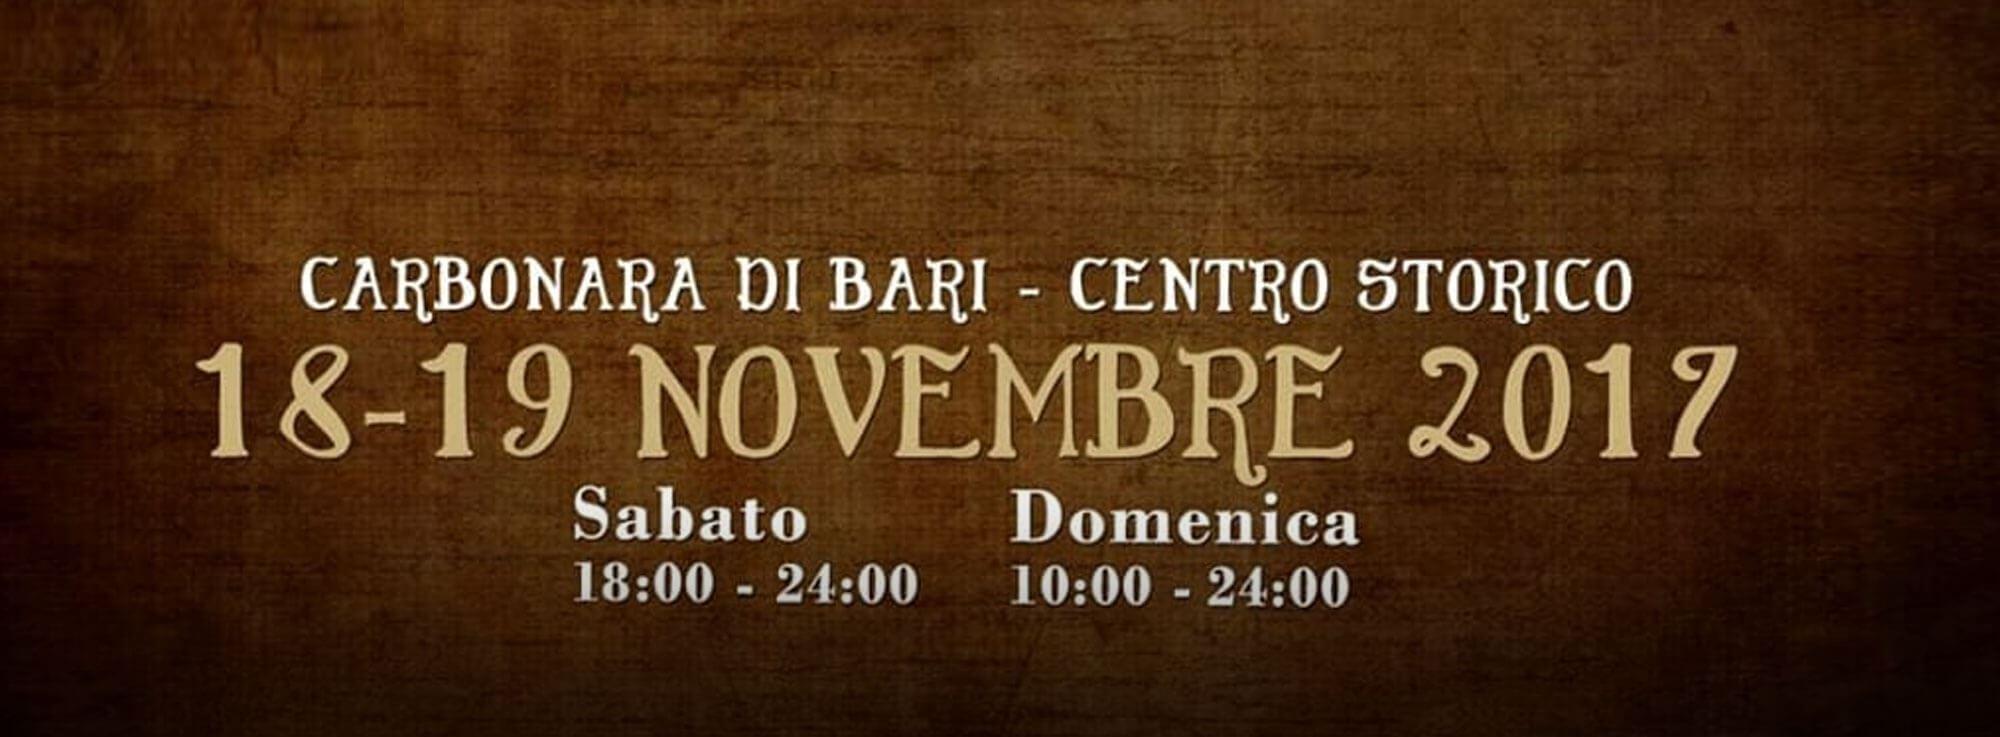 Carbonara Di Bari Storia carbonara nel 300, alla scoperta di storia e sapori medievali